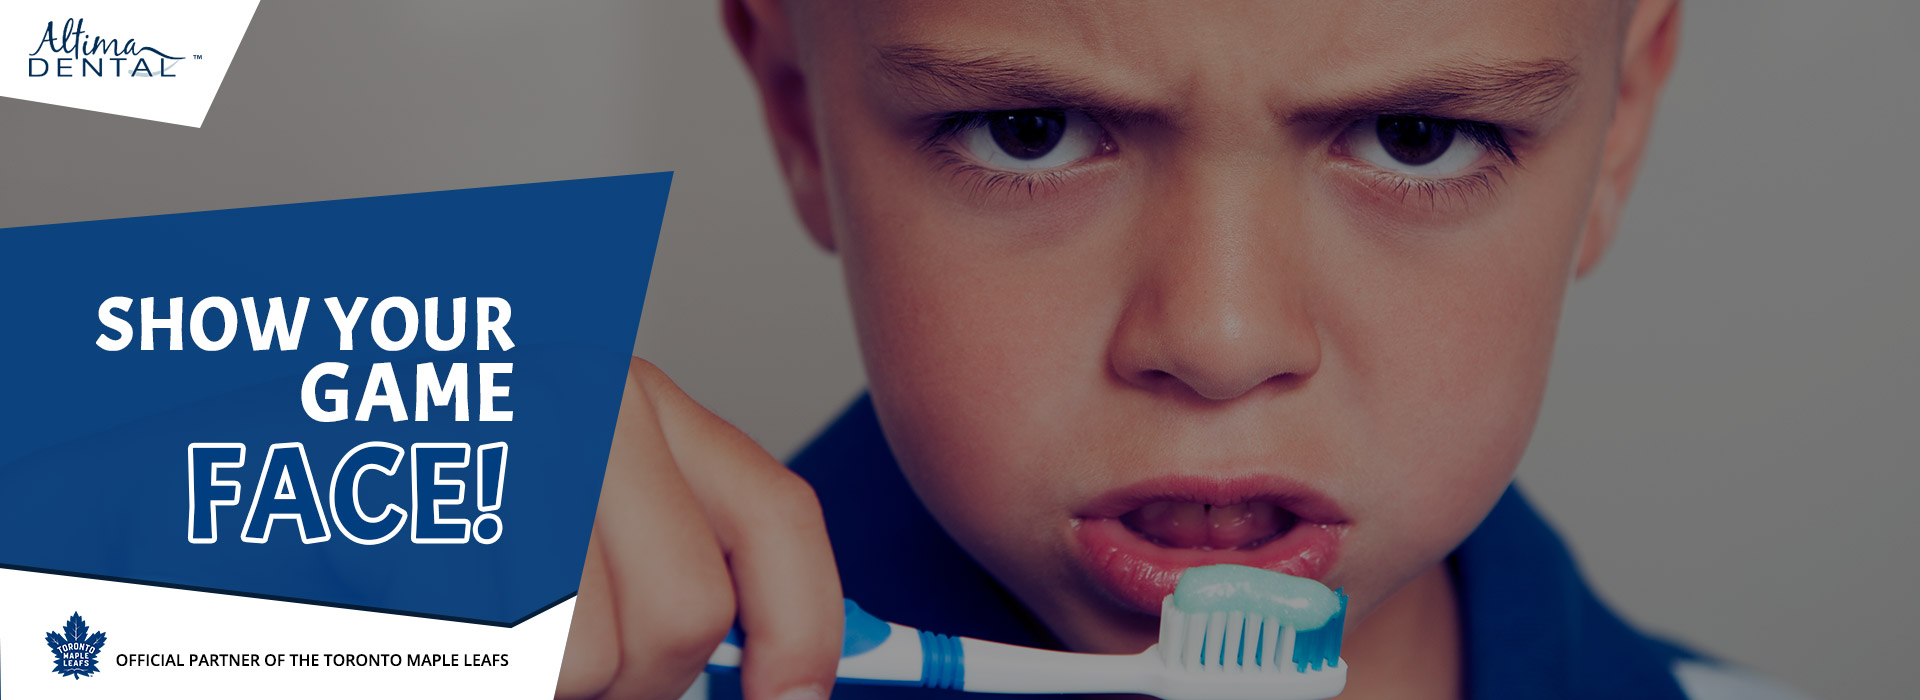 Dentist in Toronto & Across Canada - Altima Dental